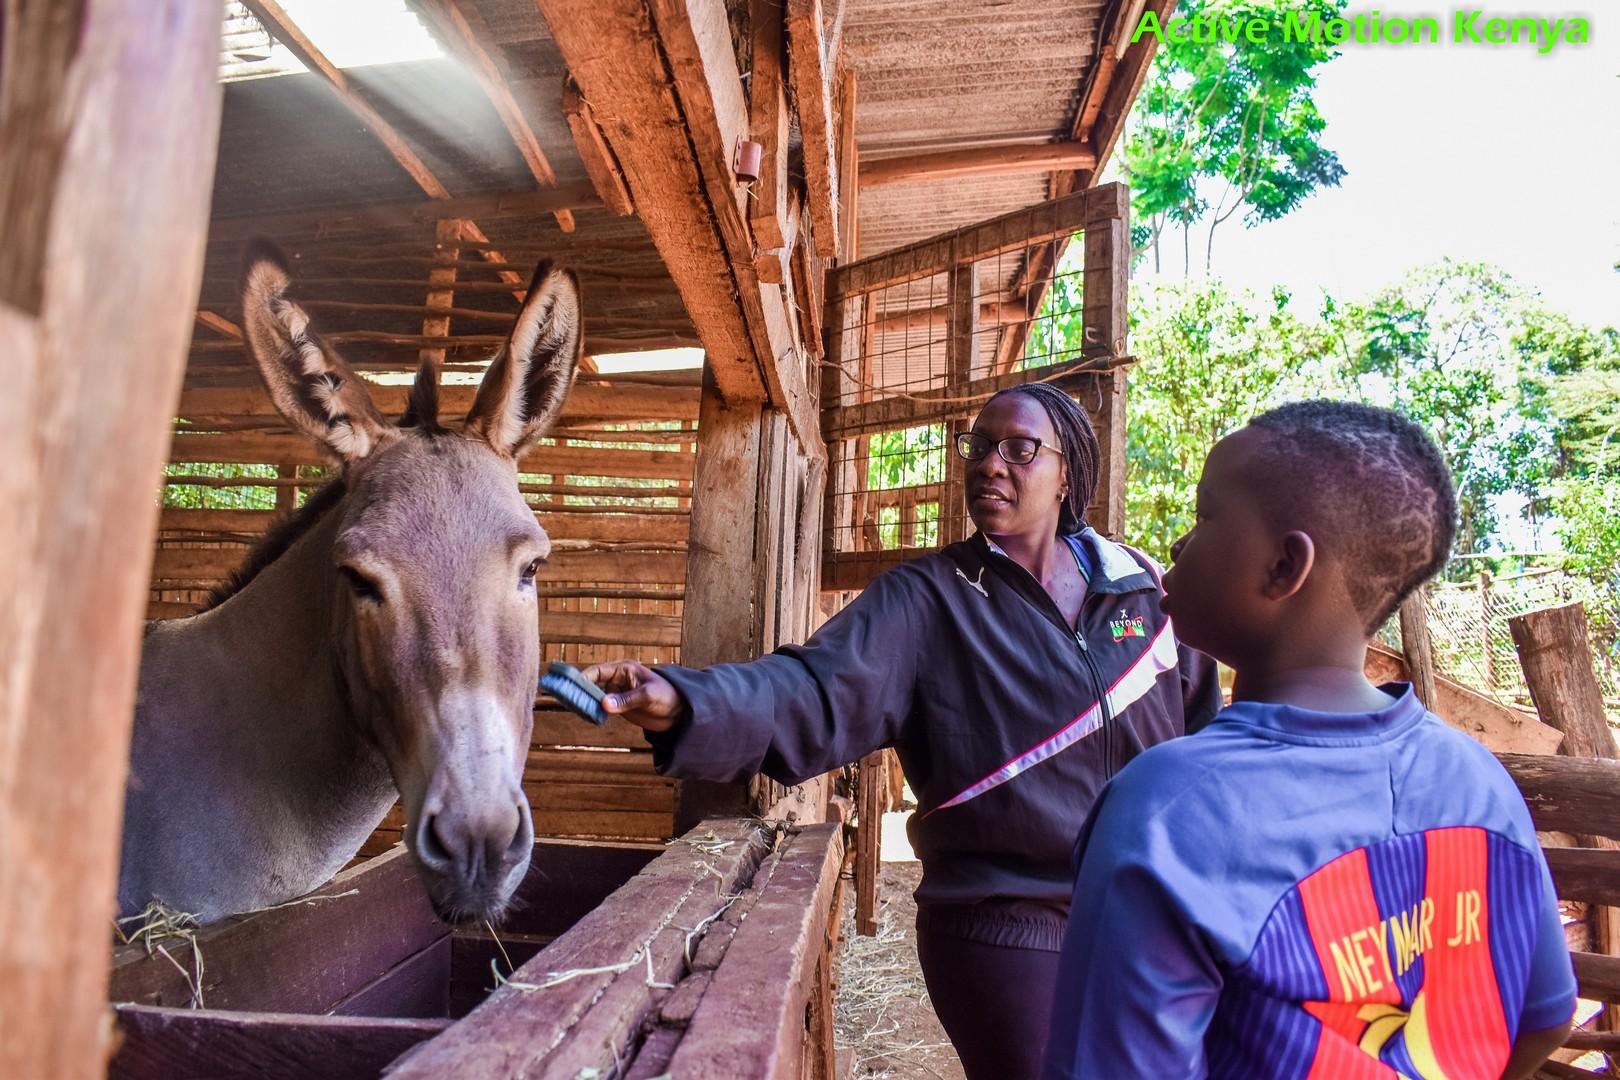 Playing with Reza the donkey at Mlango Farm, Limuru.